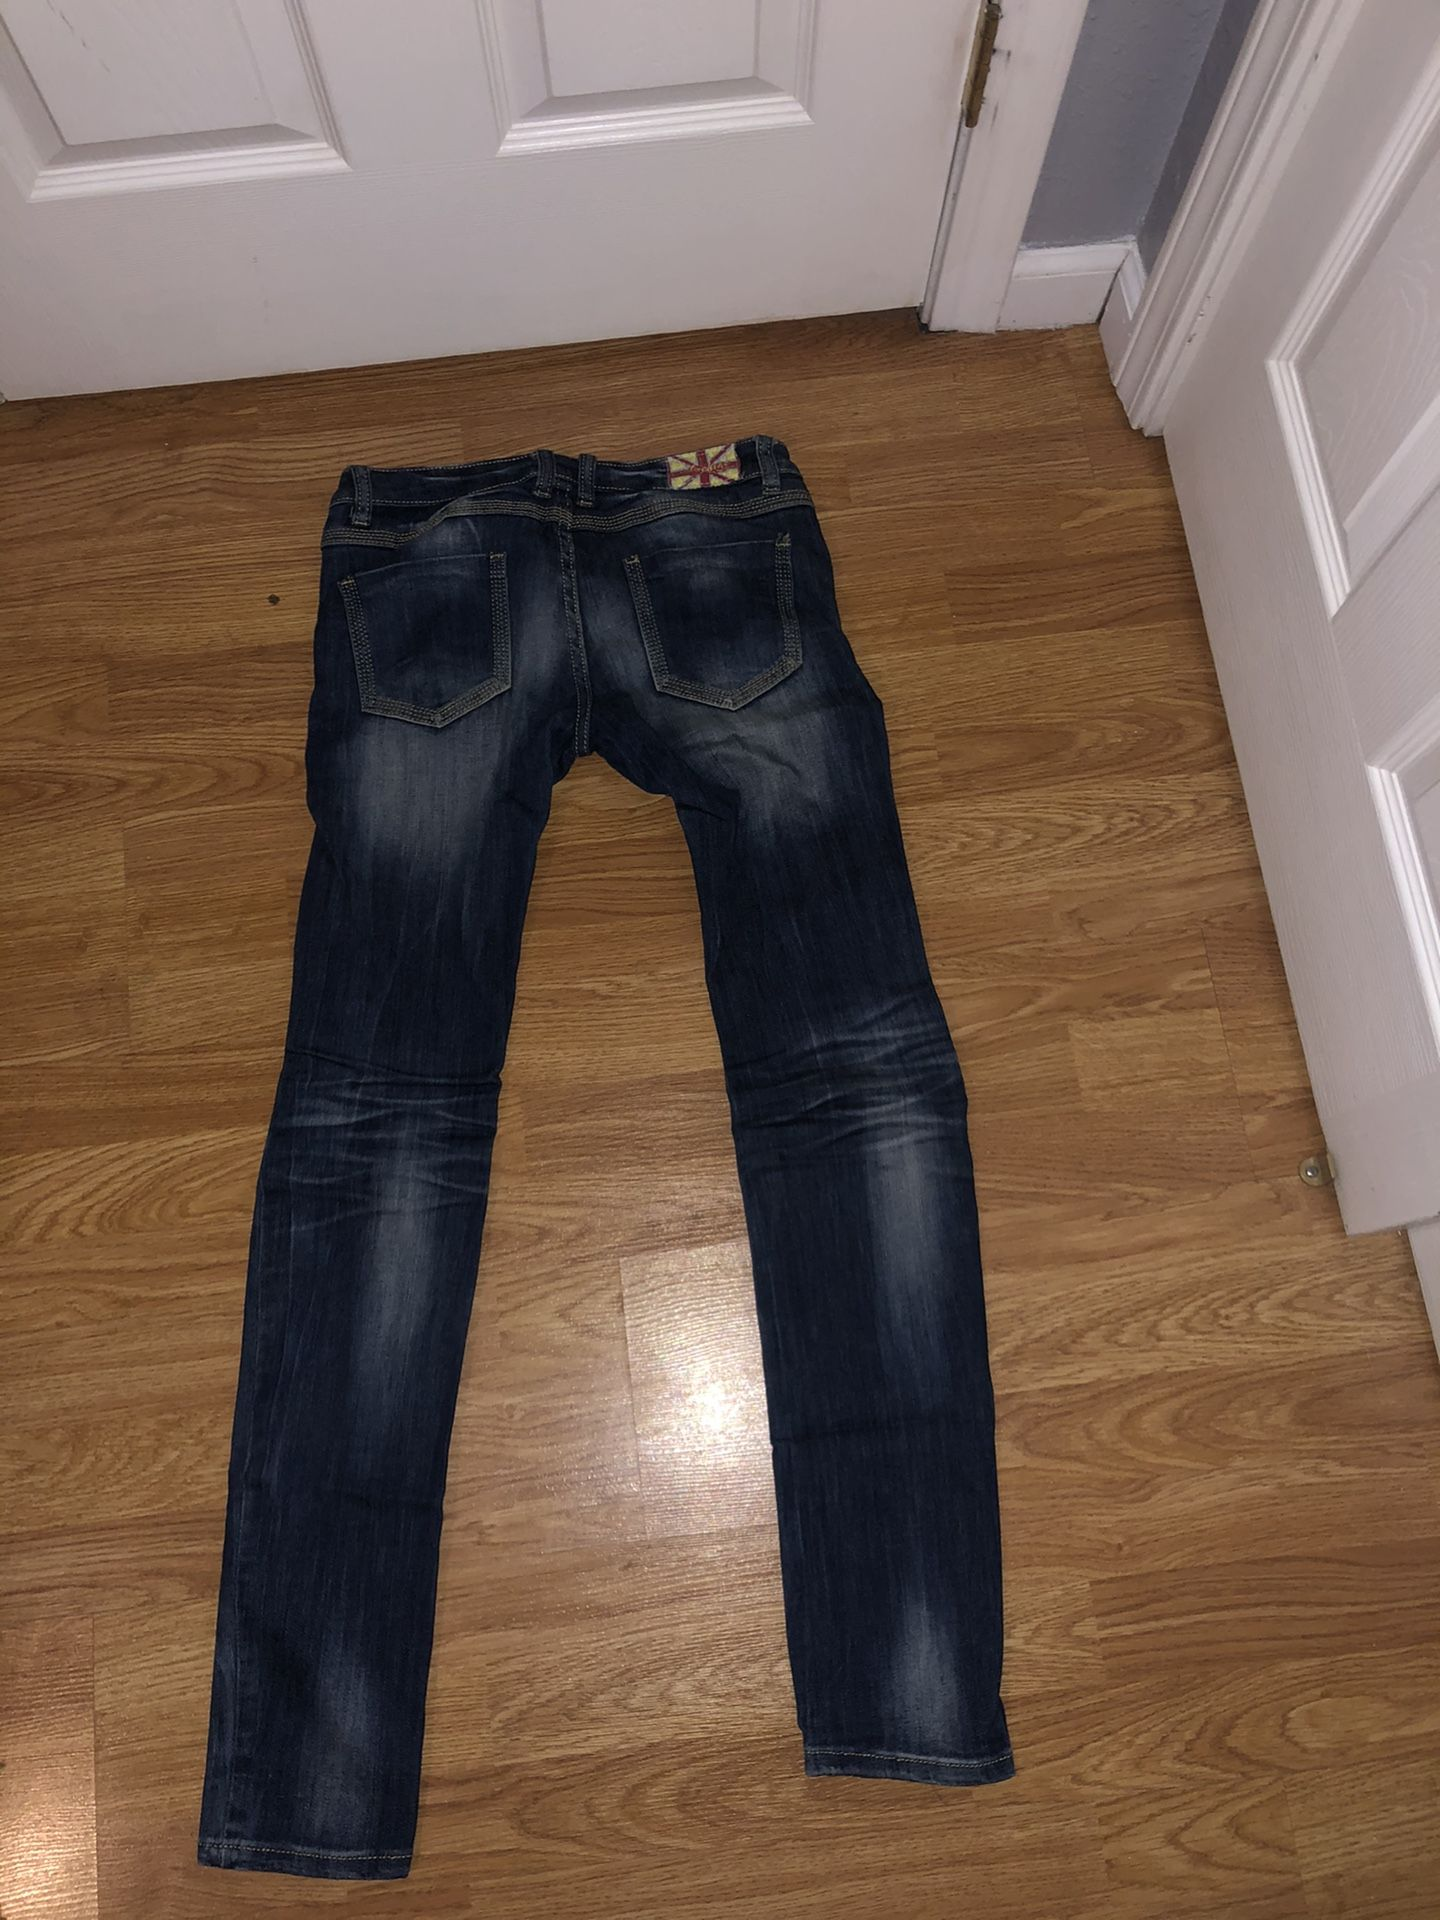 Machine brand jeans